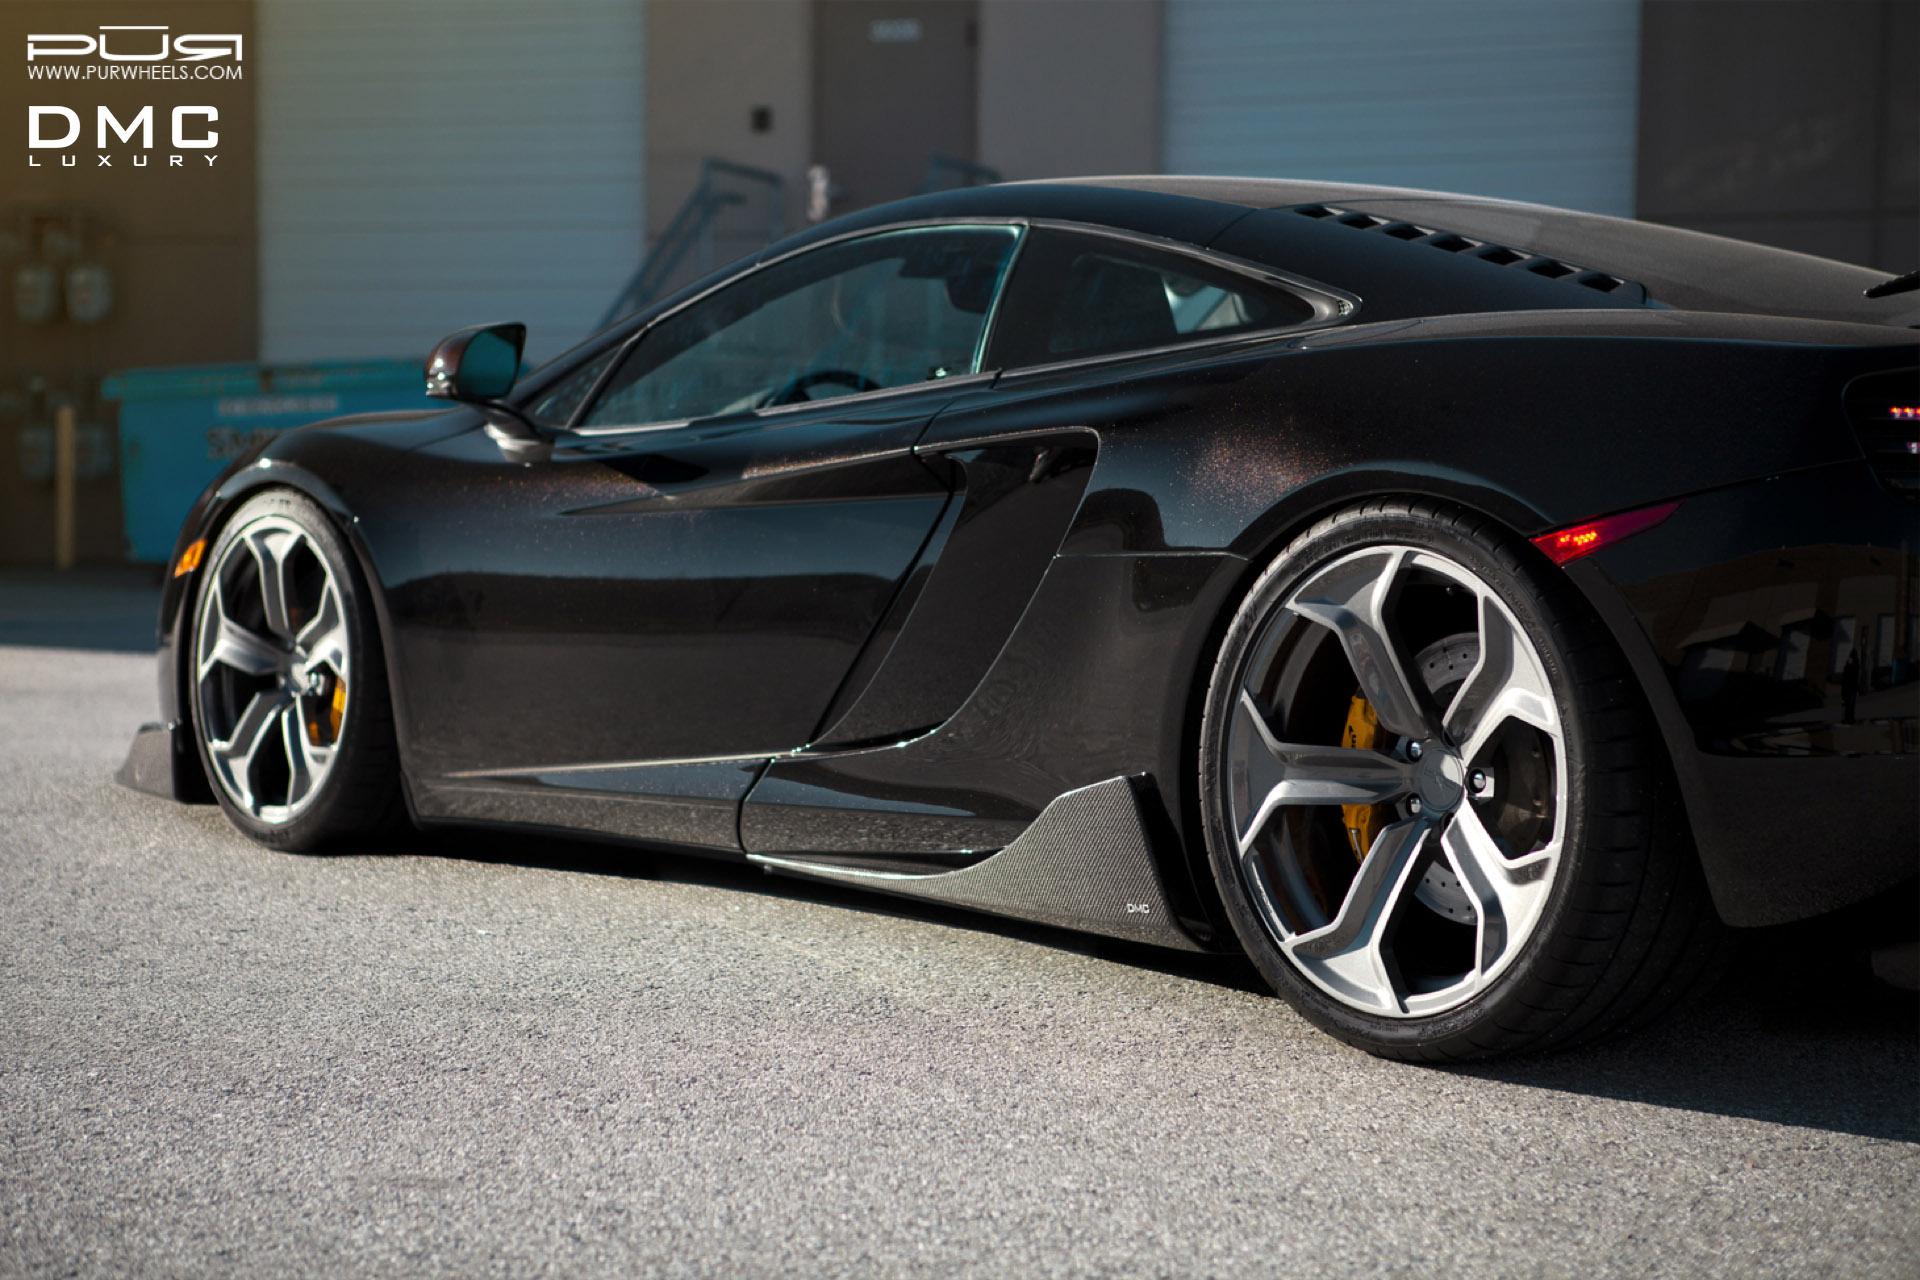 mclaren mp4-12cdmc luxury and pur wheels - picture 92415